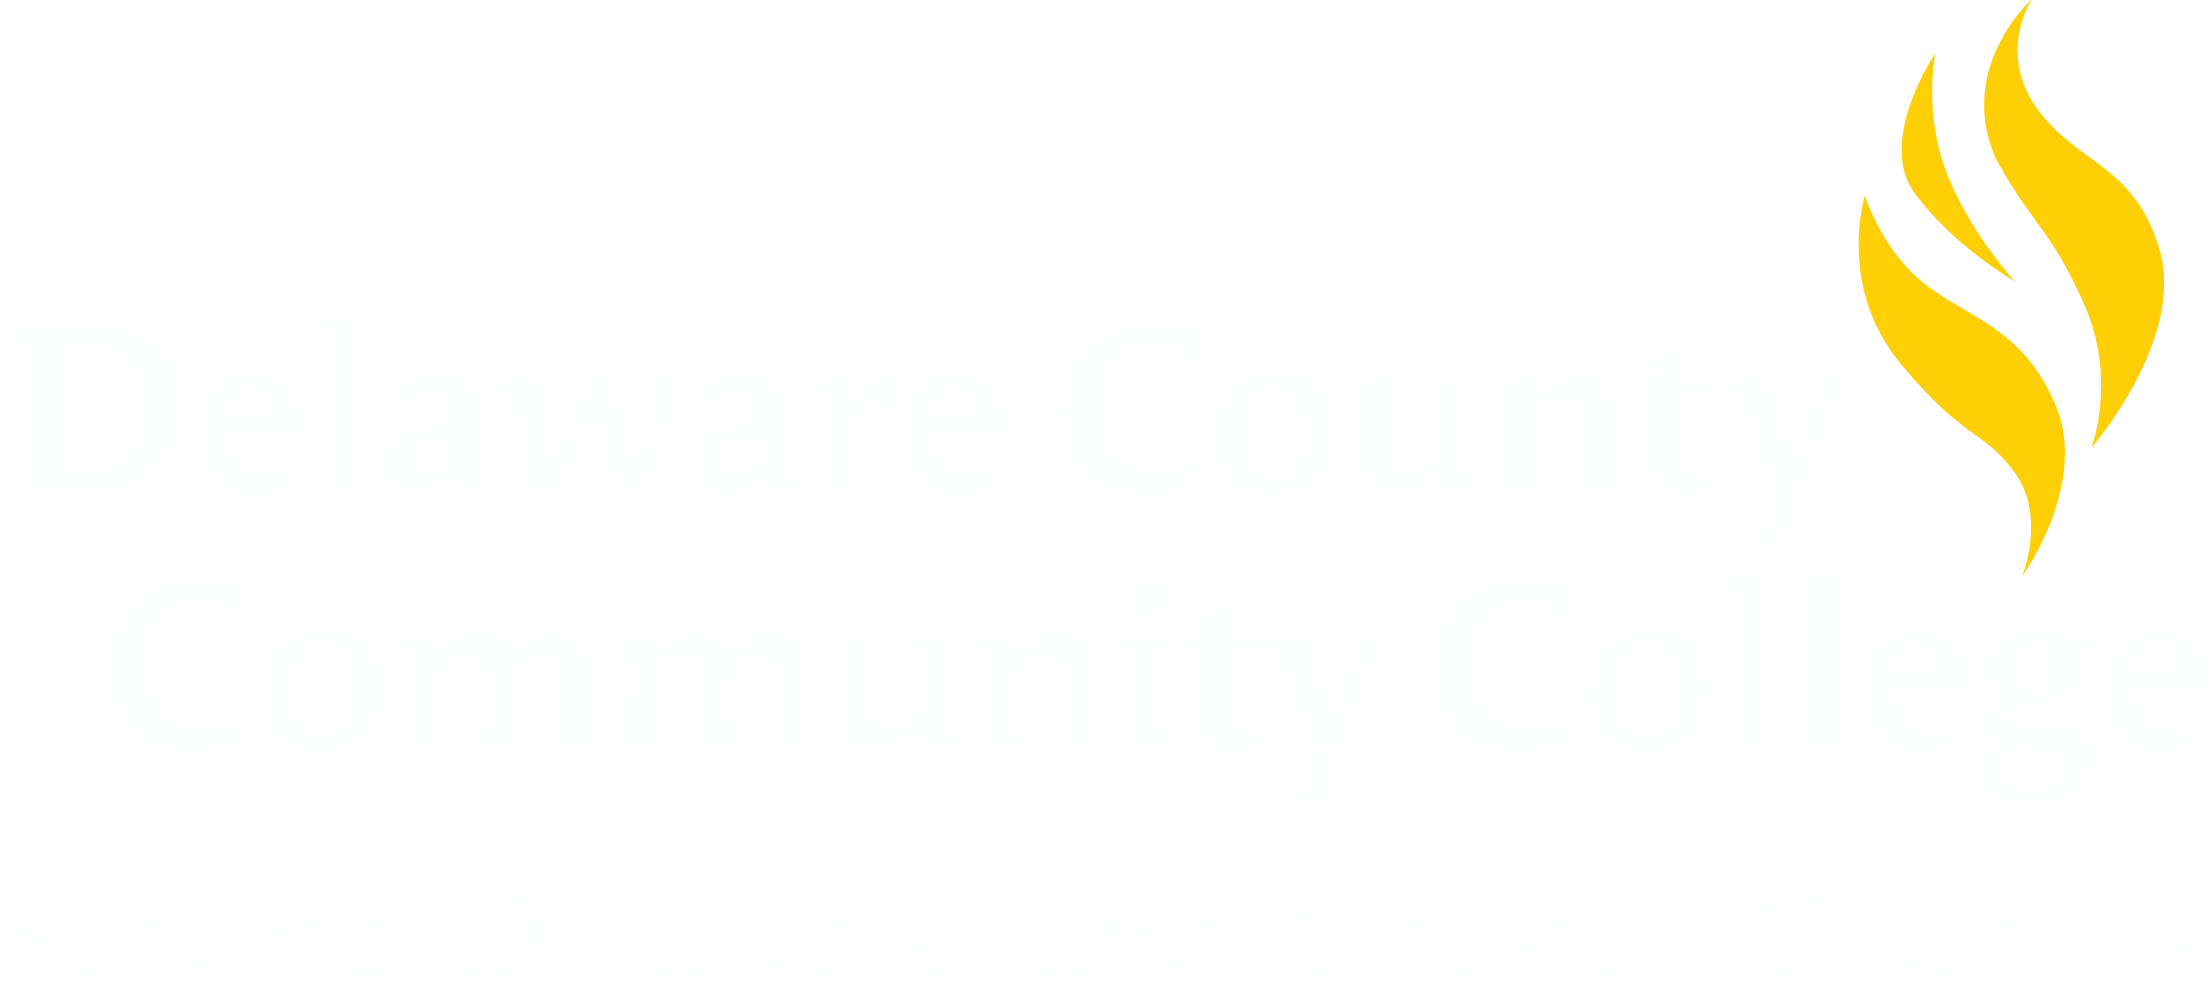 Home - Delaware County Community College pertaining to Delaware County Community College Academic Calendar 2021